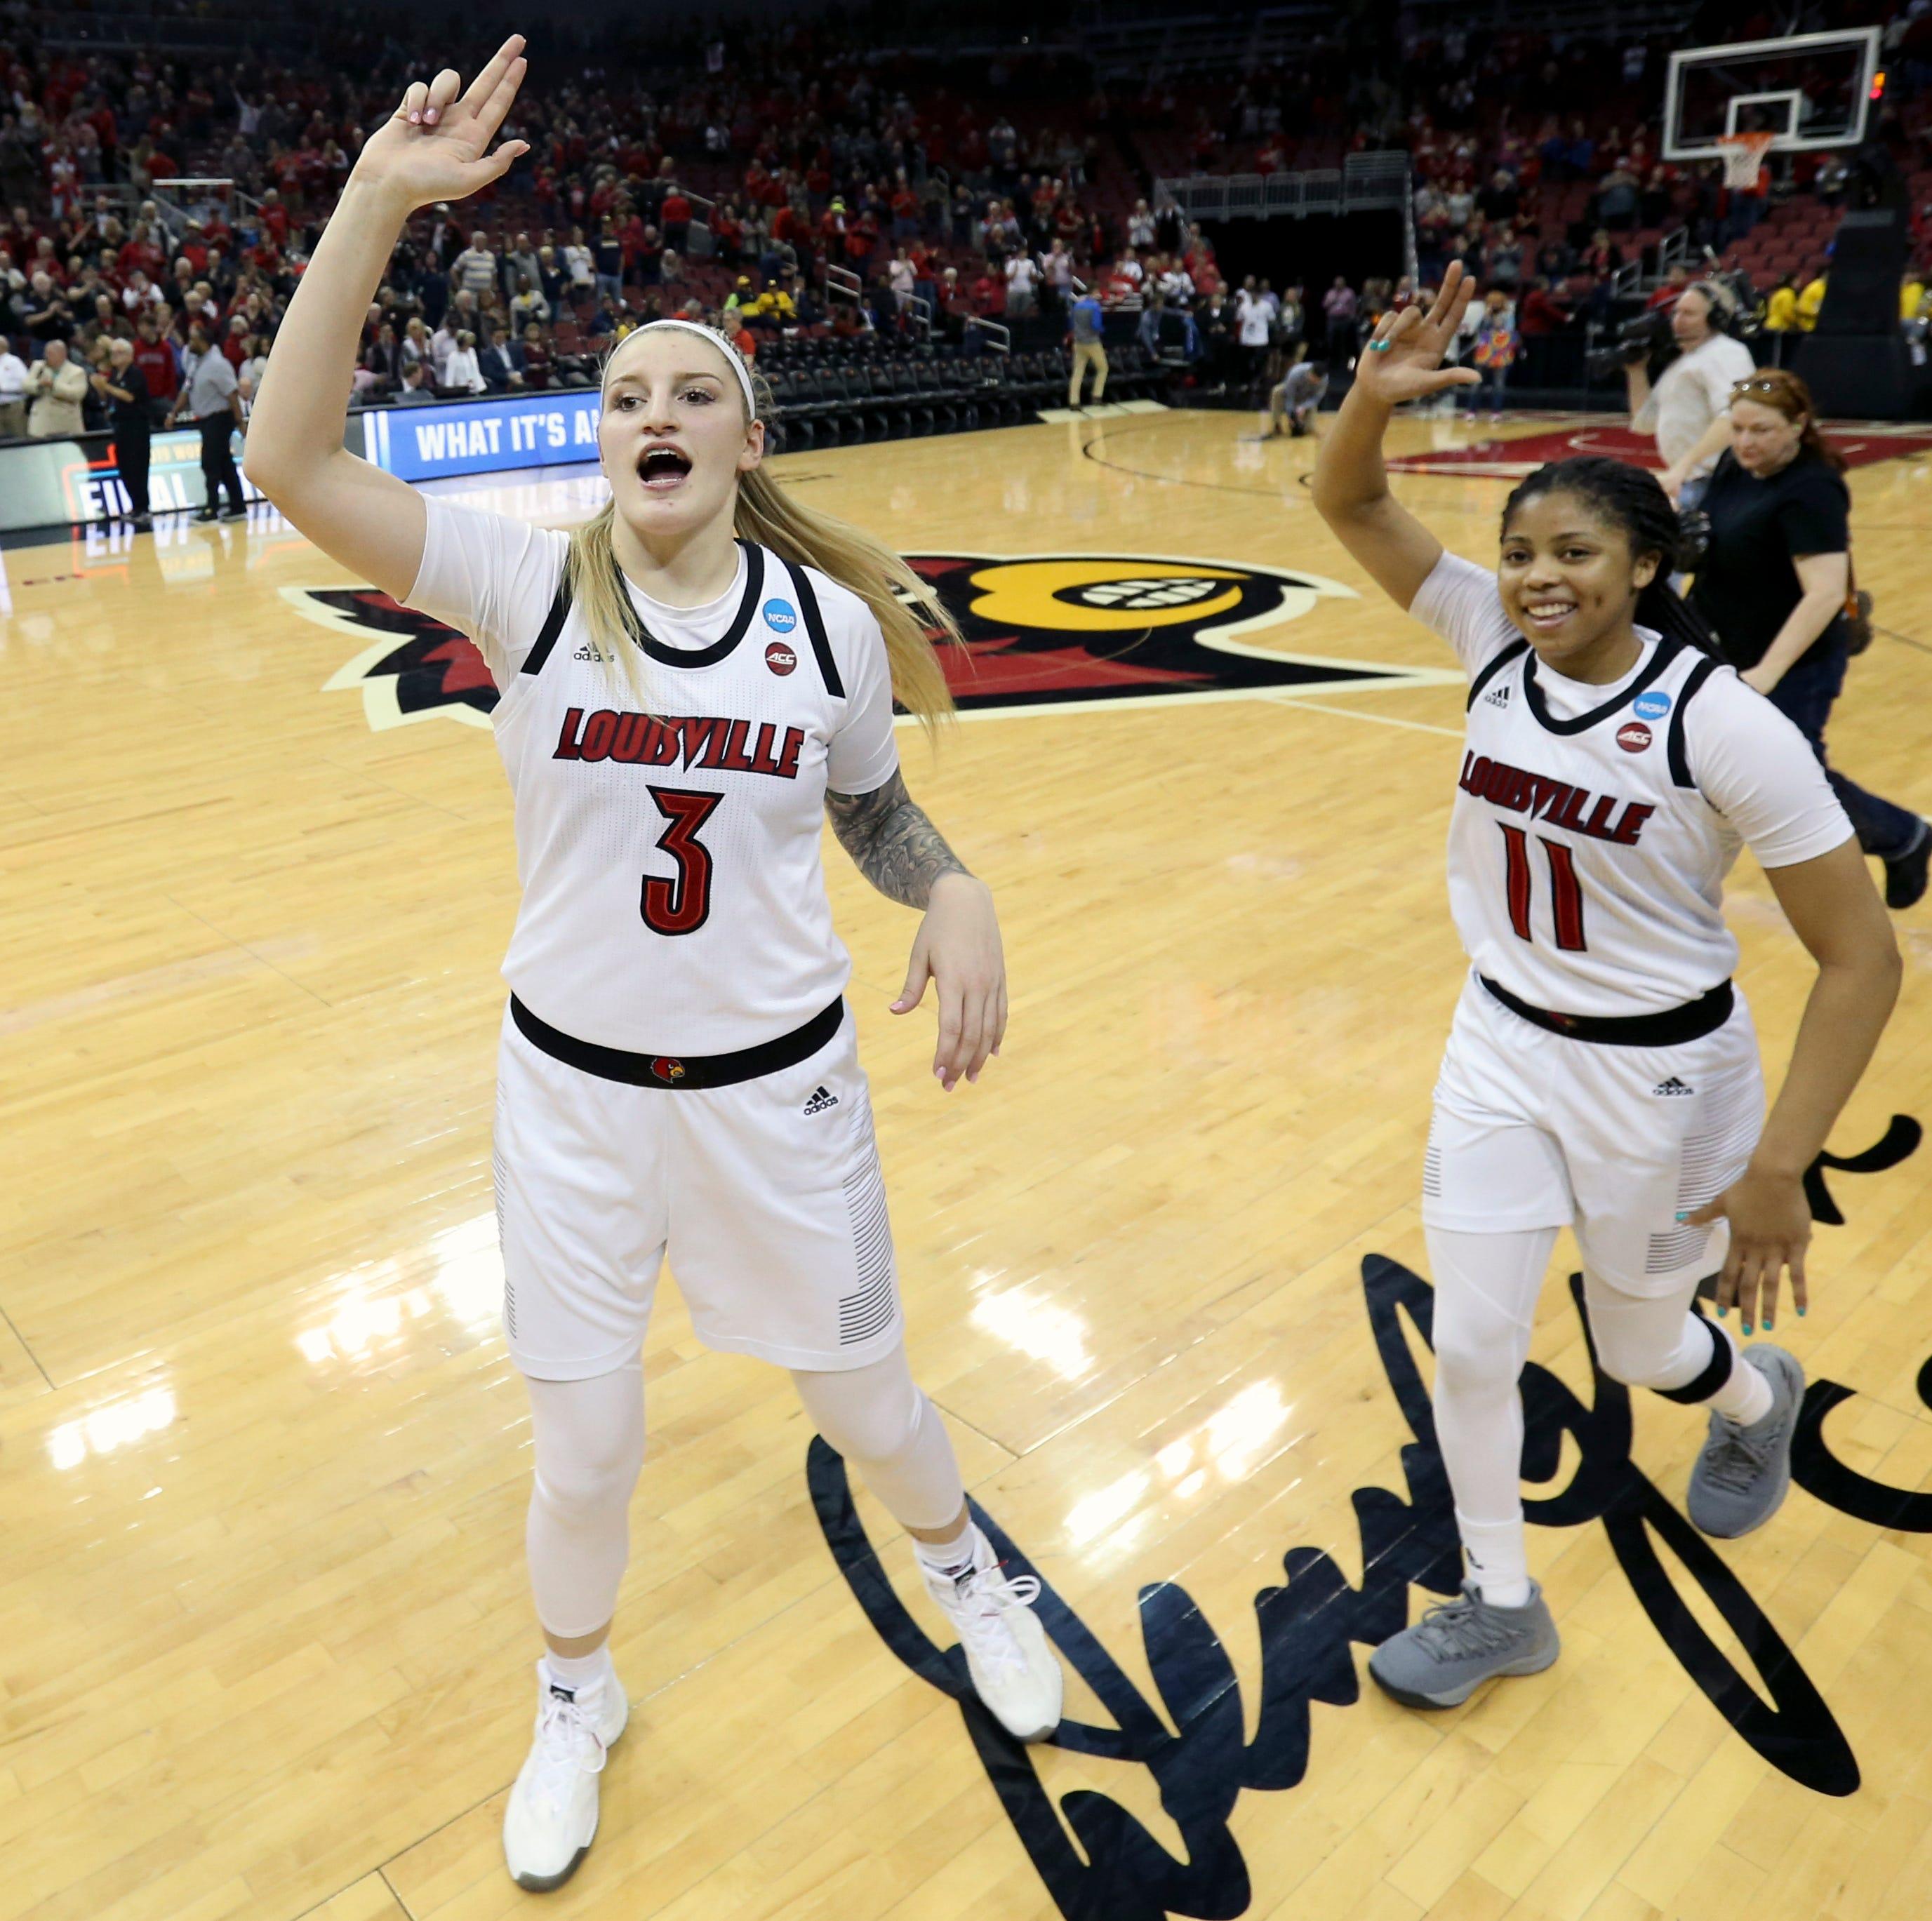 Louisville's Arica Carter, Sam Fuehring drafted in WNBA third round